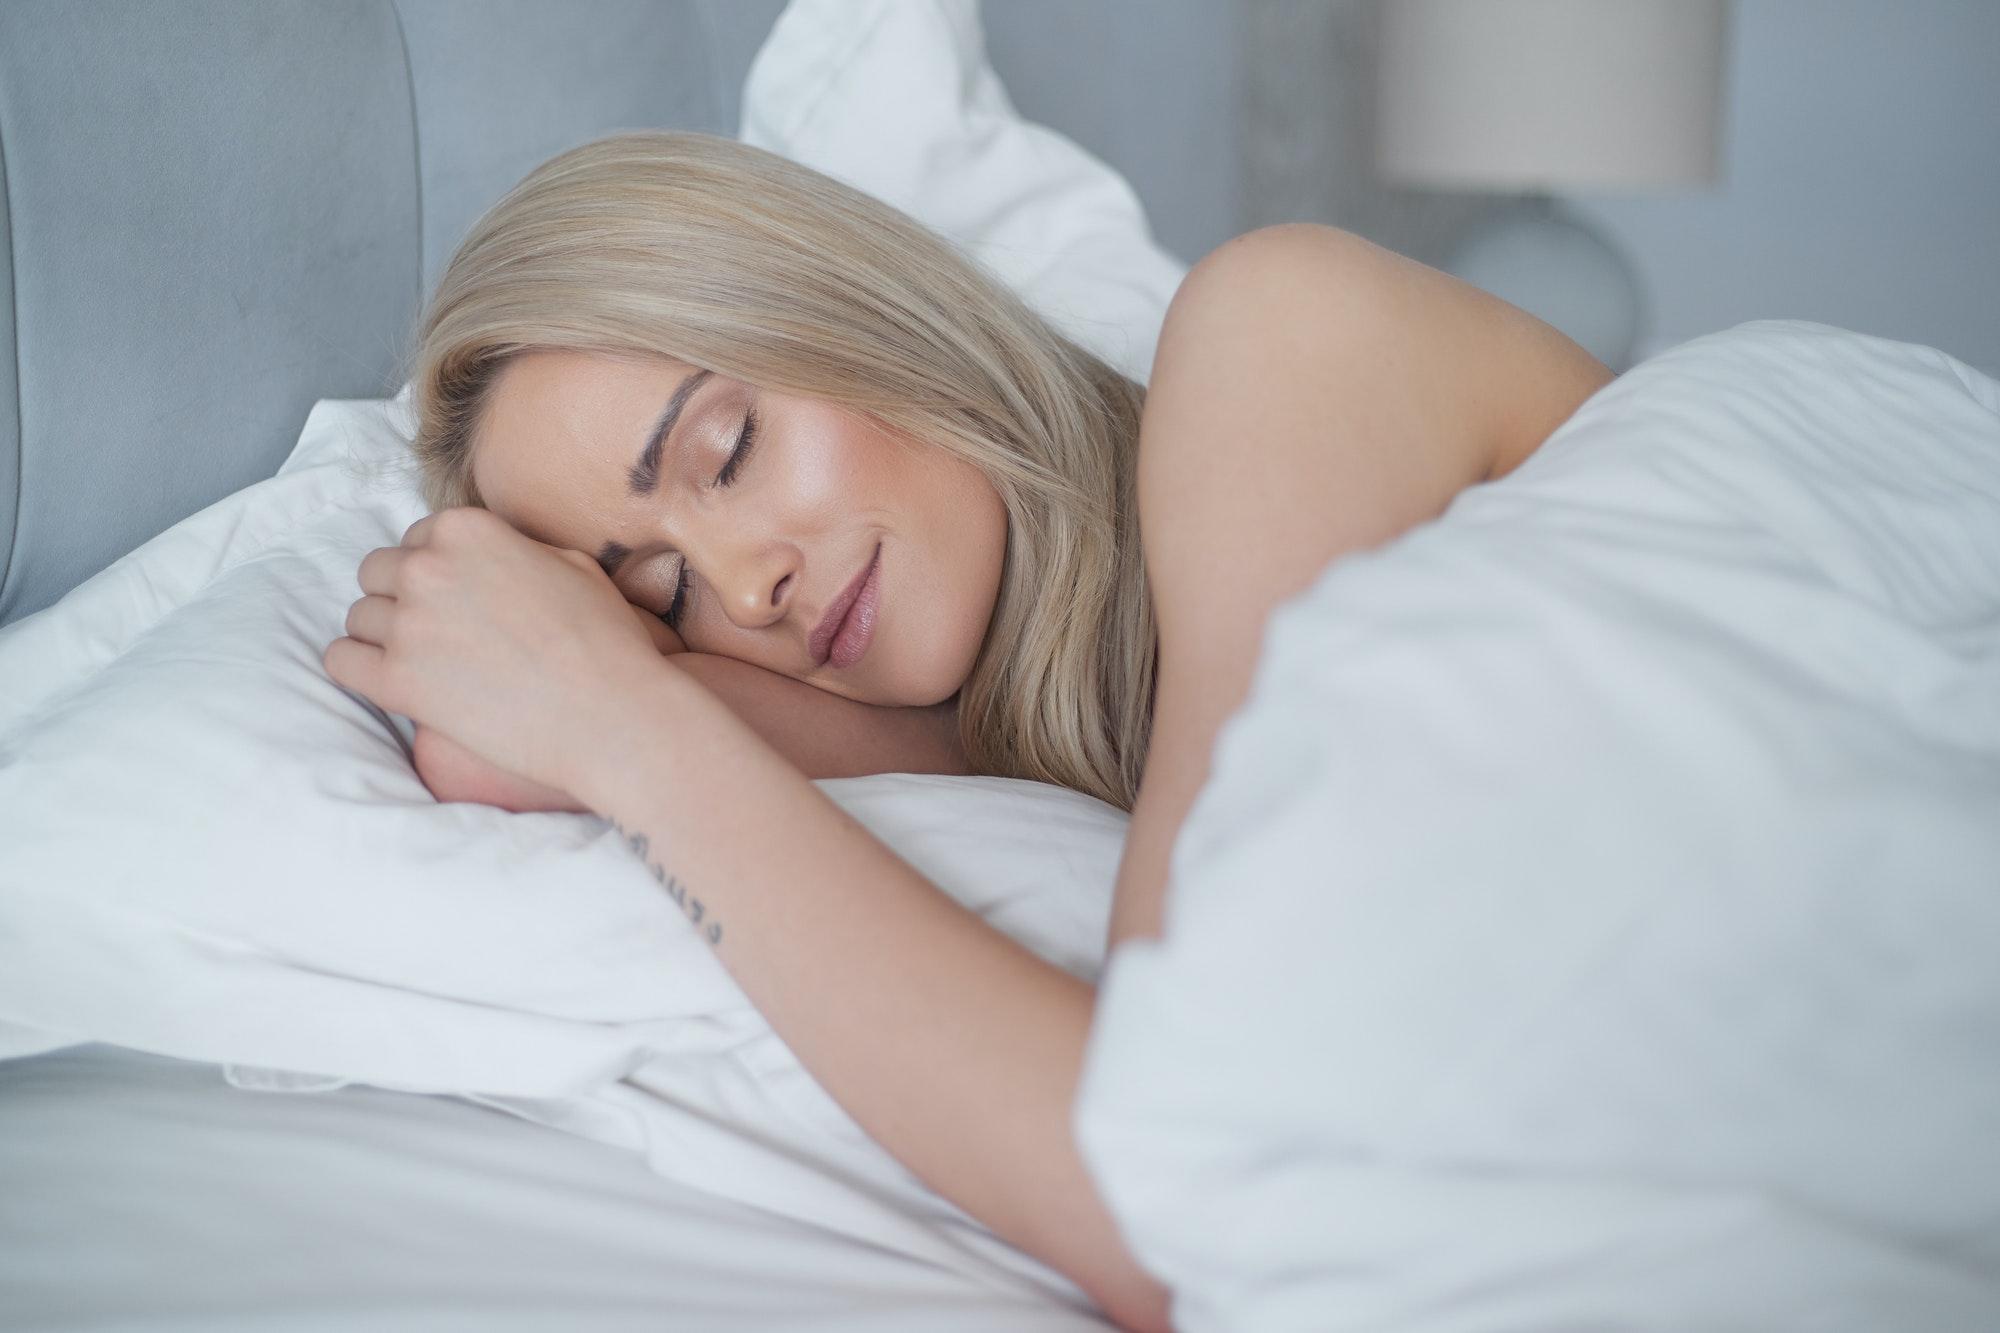 Young beautiful blonde woman sleeping in her bedroom